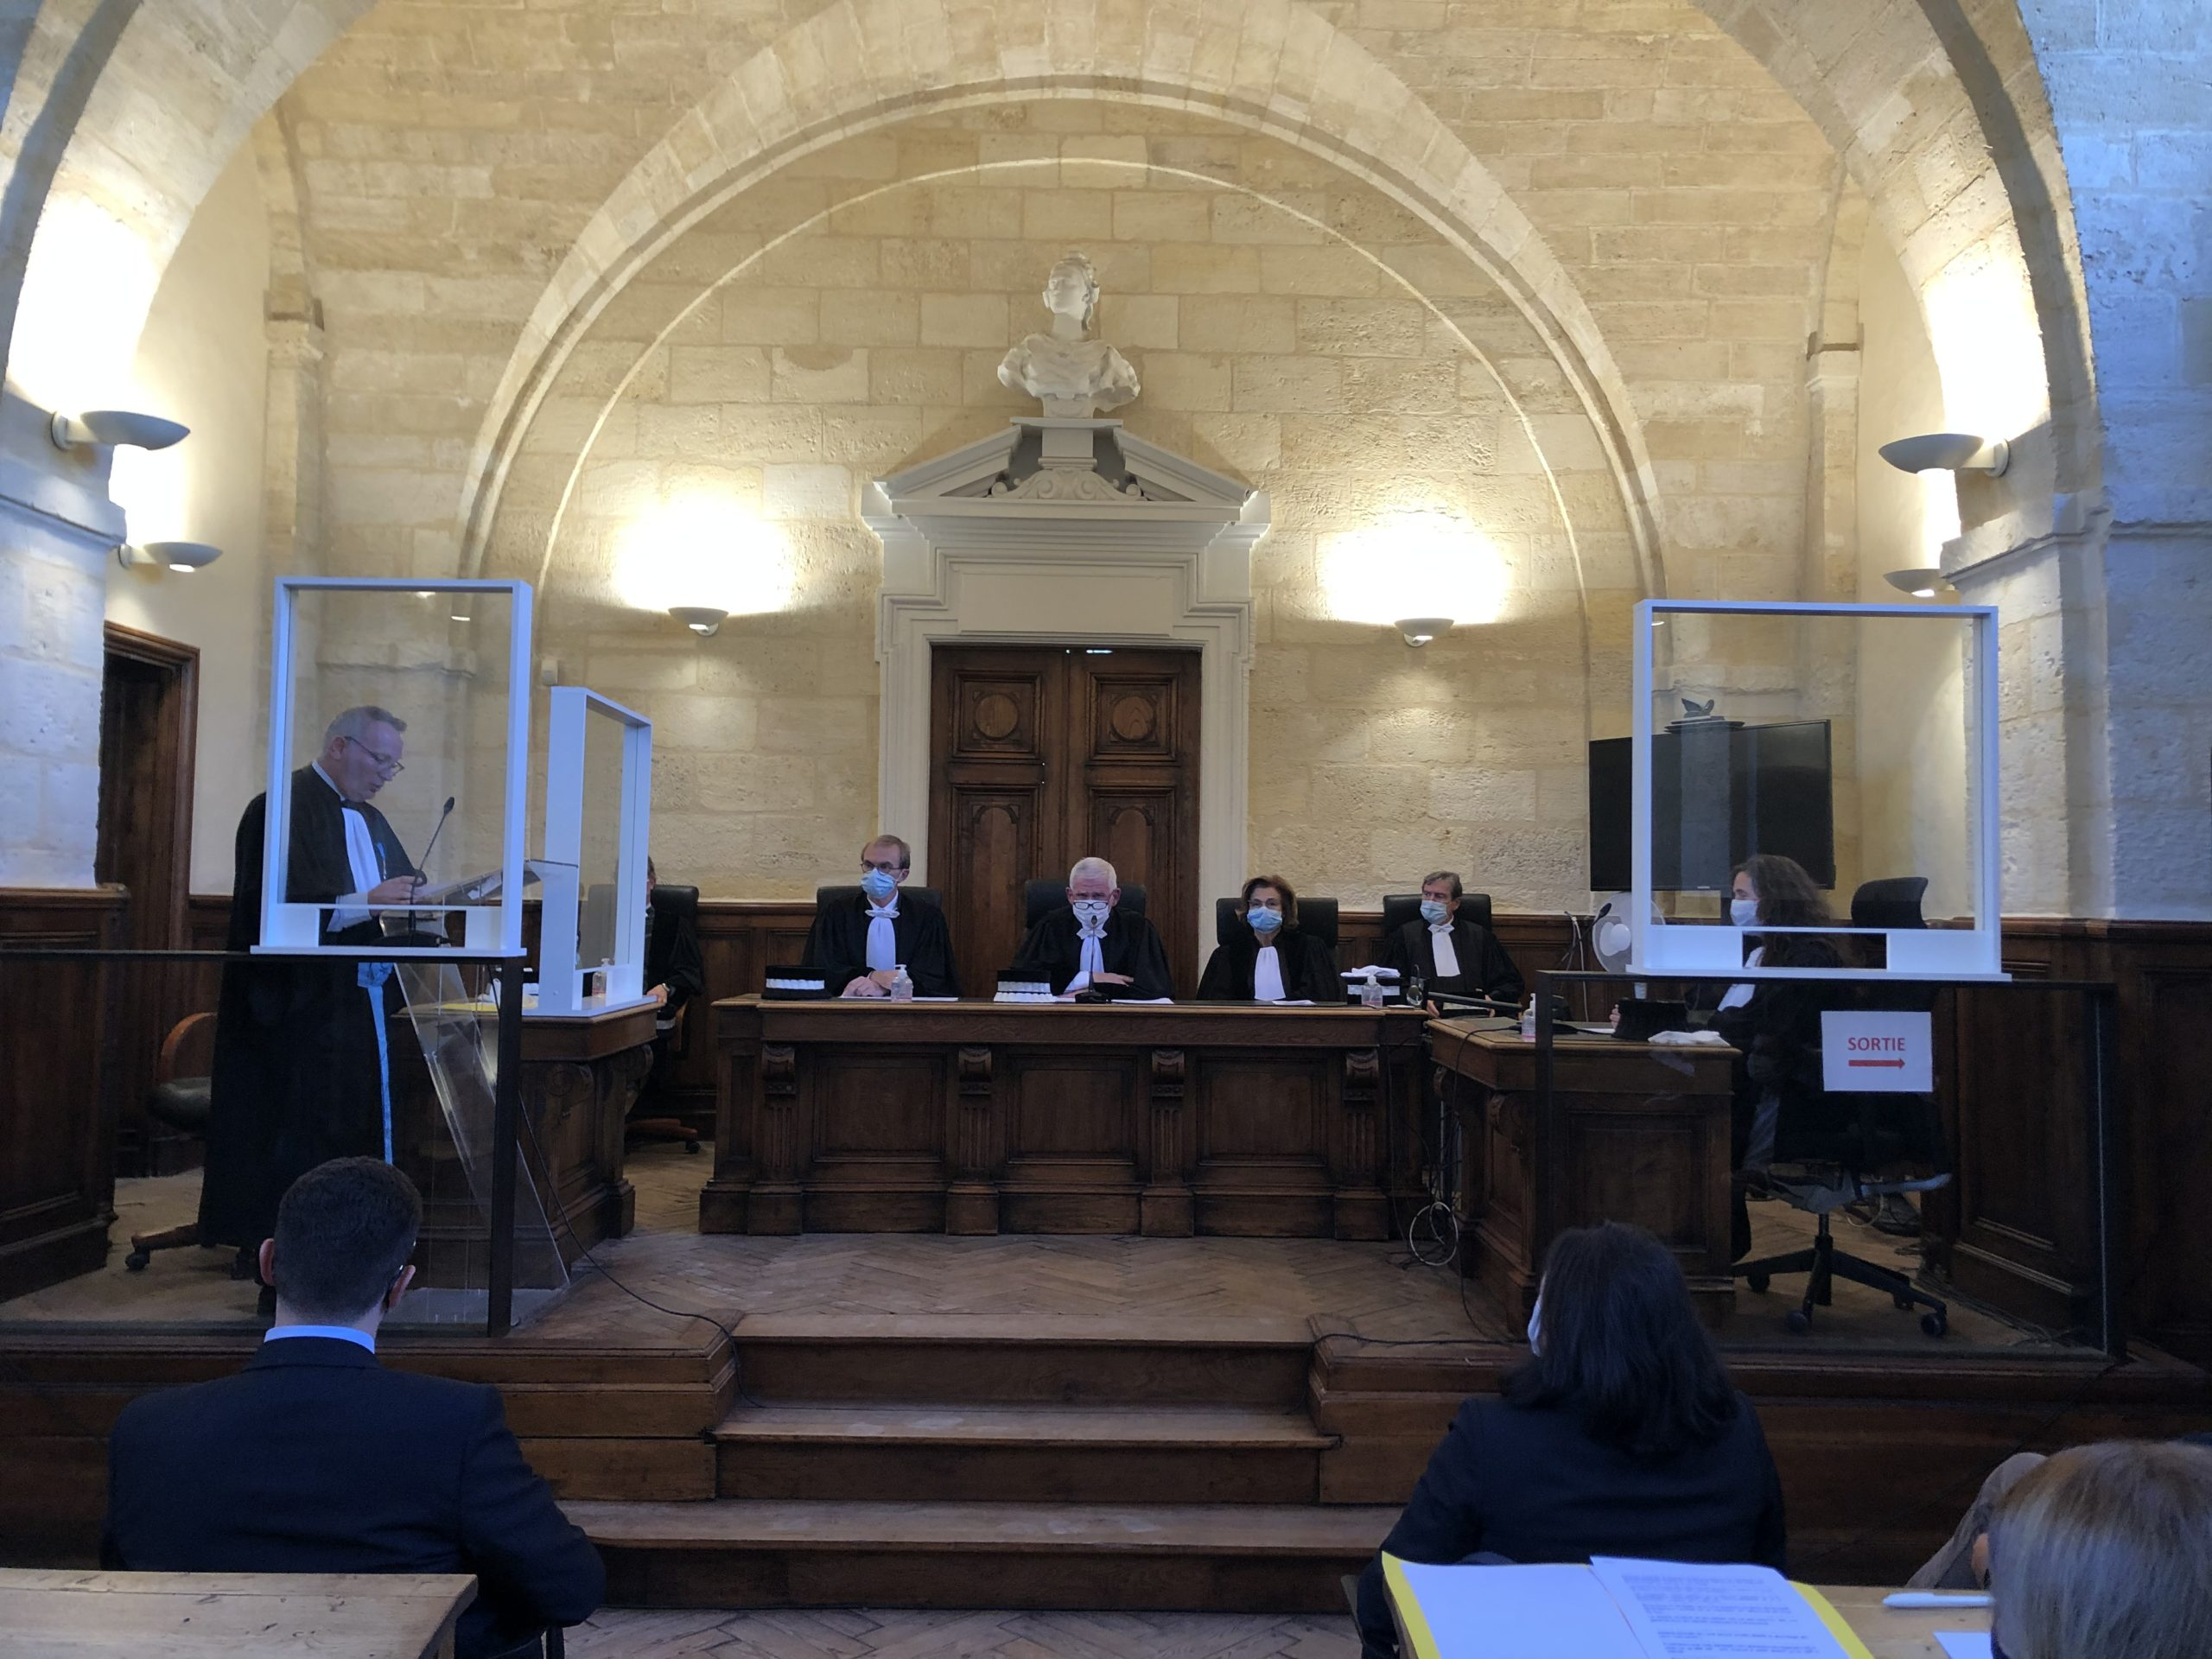 Tribunal de commerce de Libourne